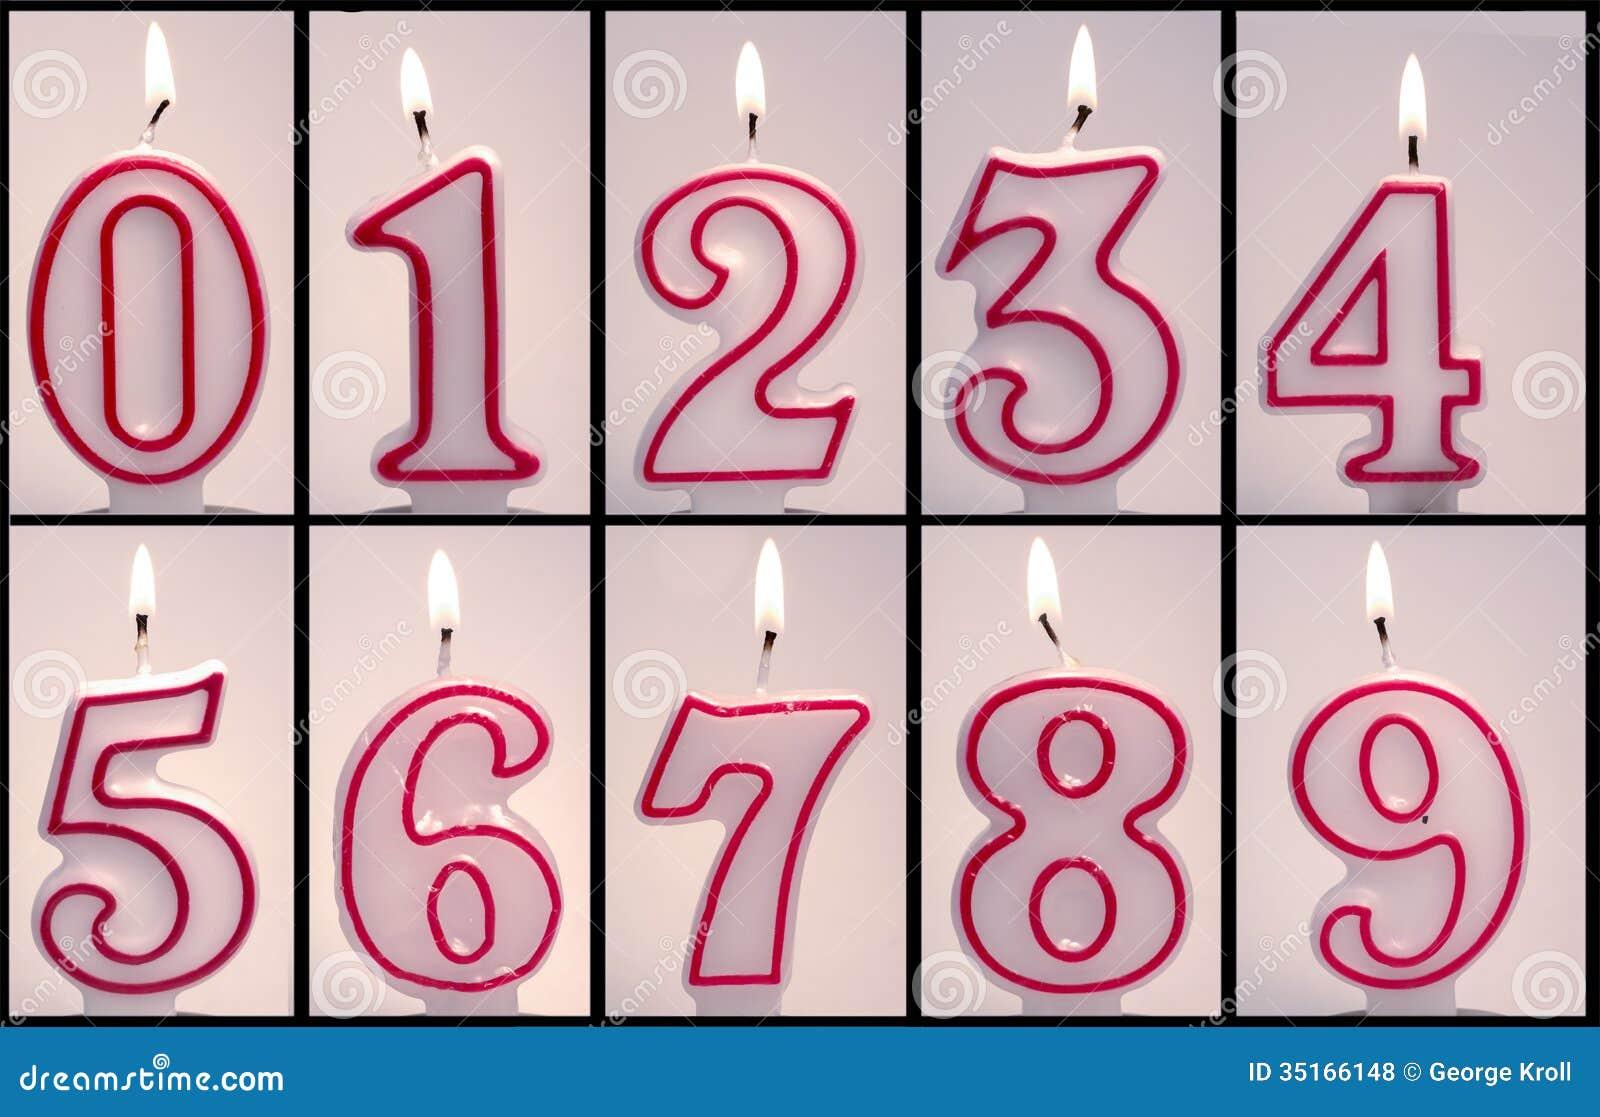 Numeric Birthday Candles Lit Royalty Free Stock Photos